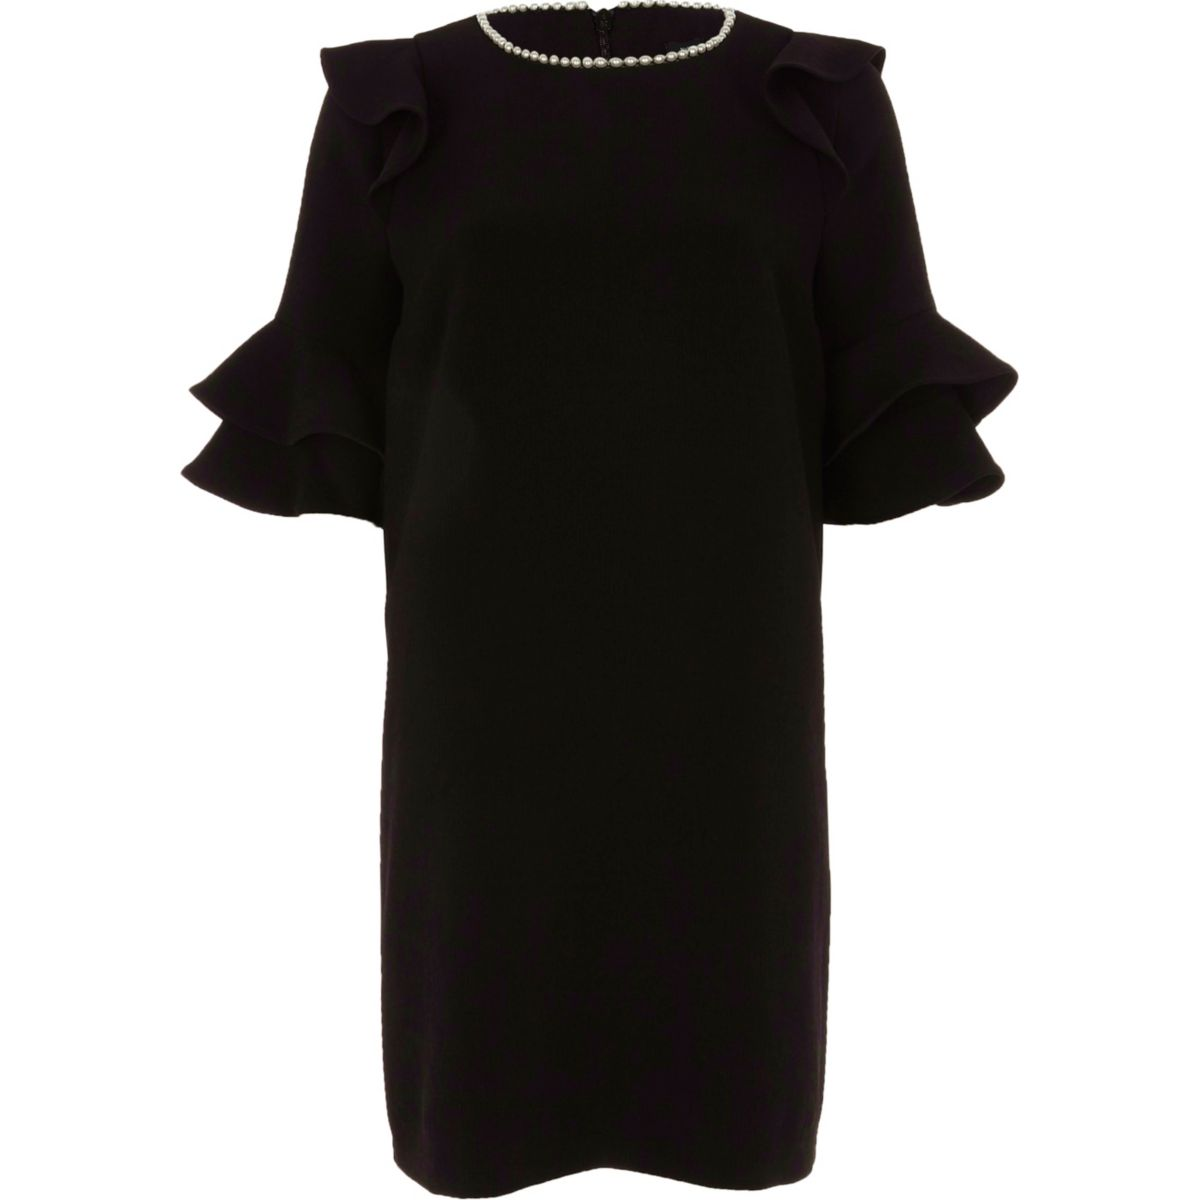 Schwarzes Swing-Kleid mit Kunstperlen